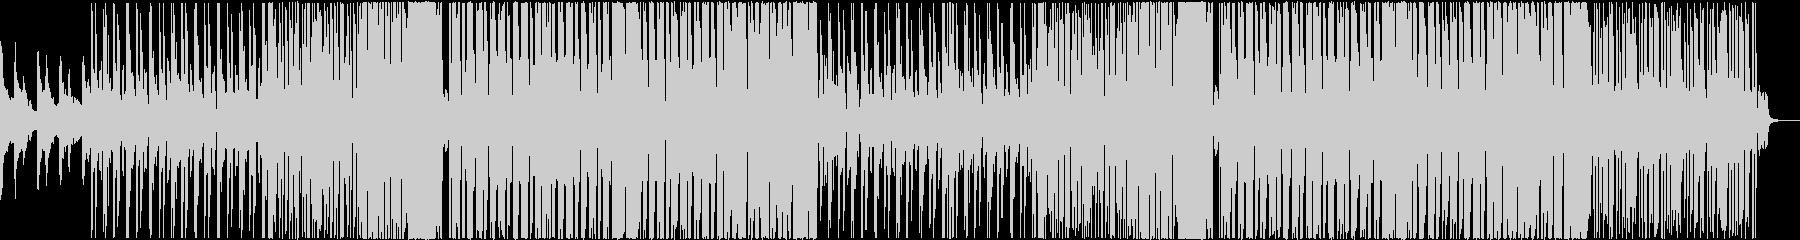 Kawaii系Future Bass 1の未再生の波形